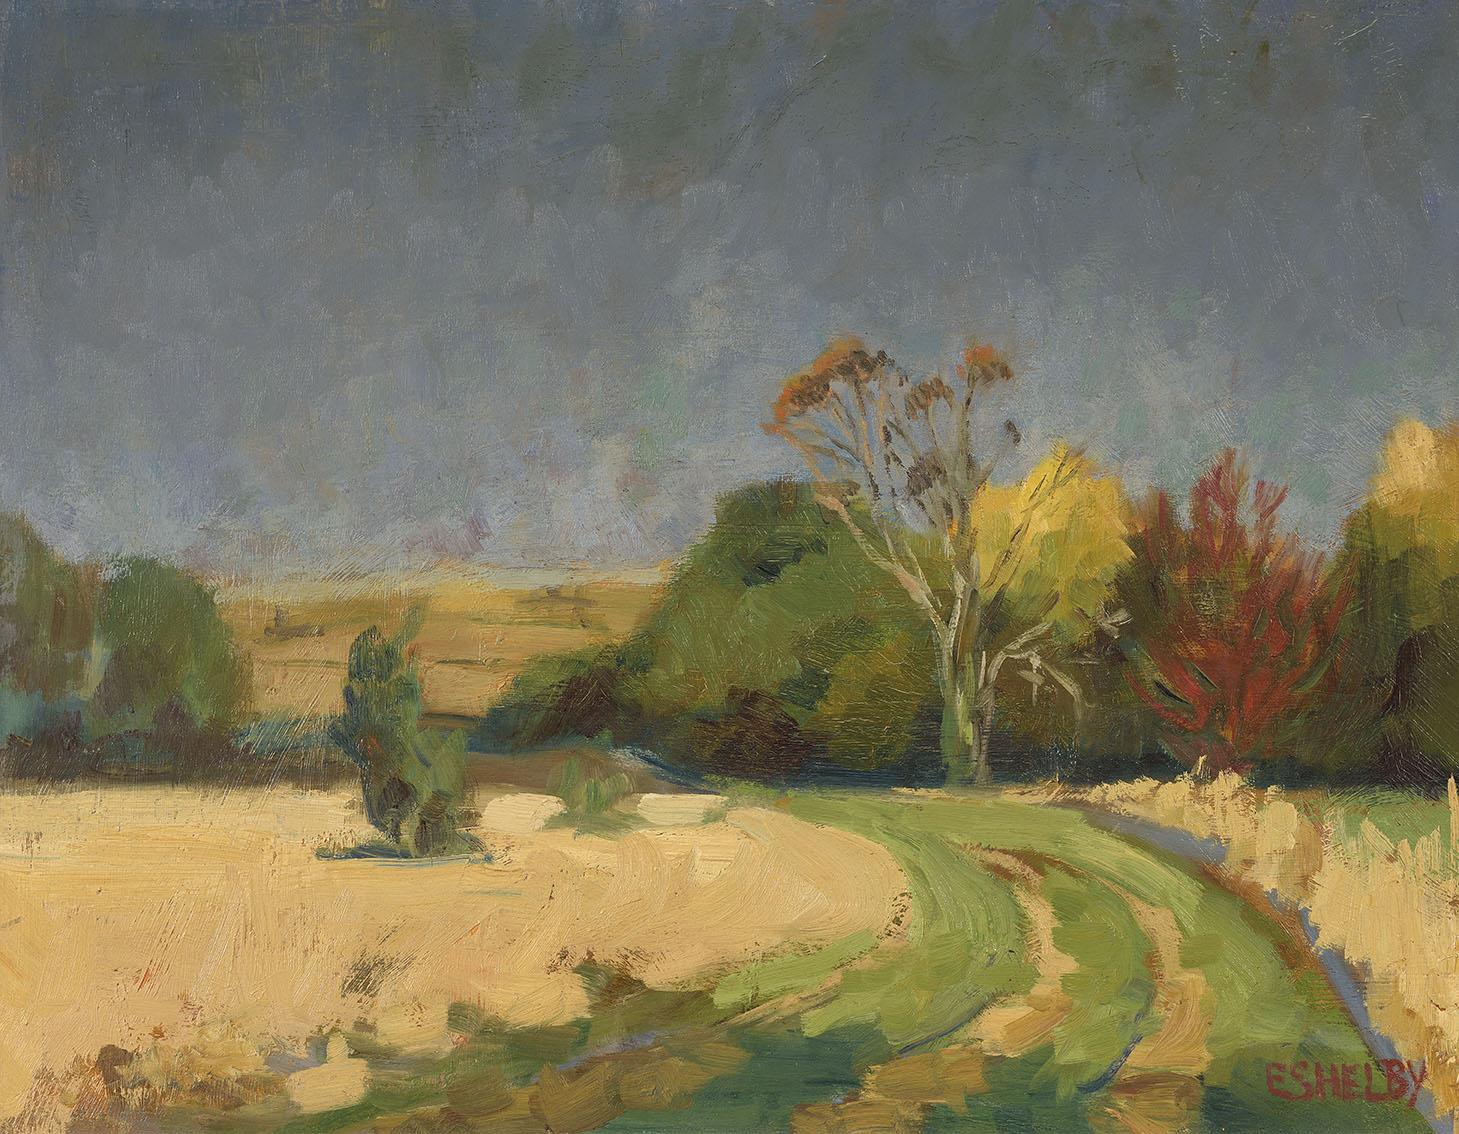 Sidney Eshelby